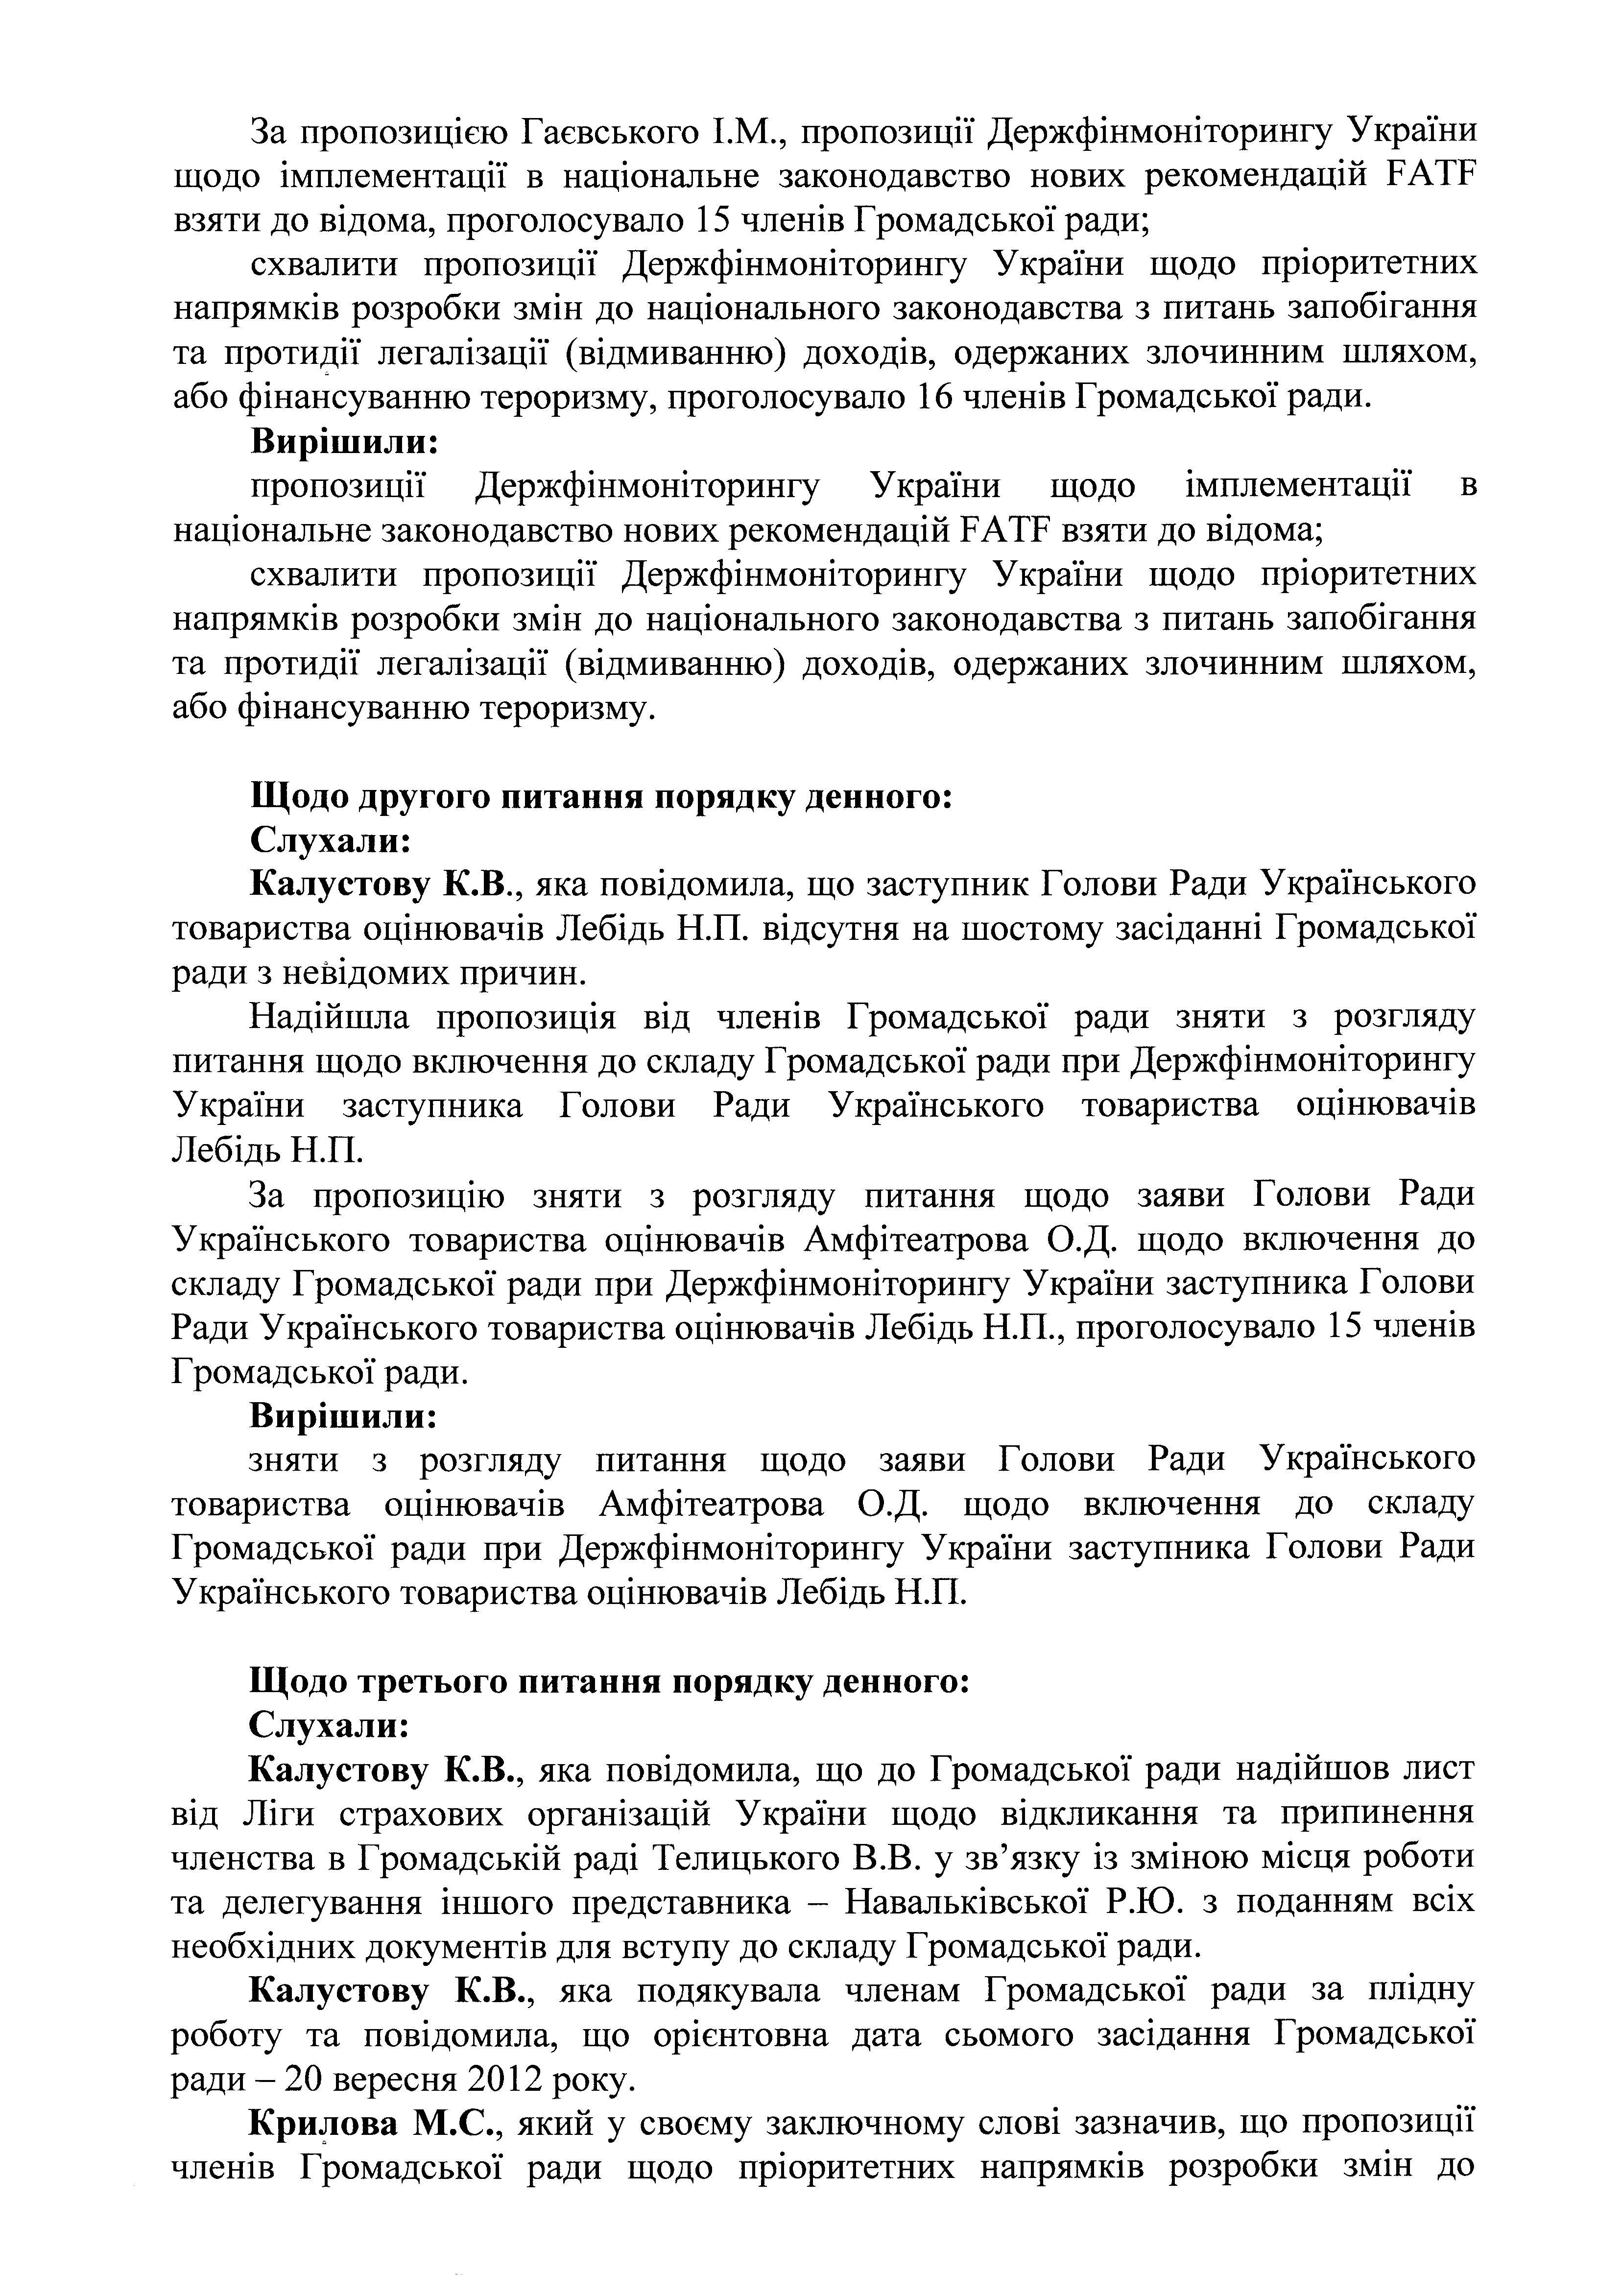 Protokol_4.jpg